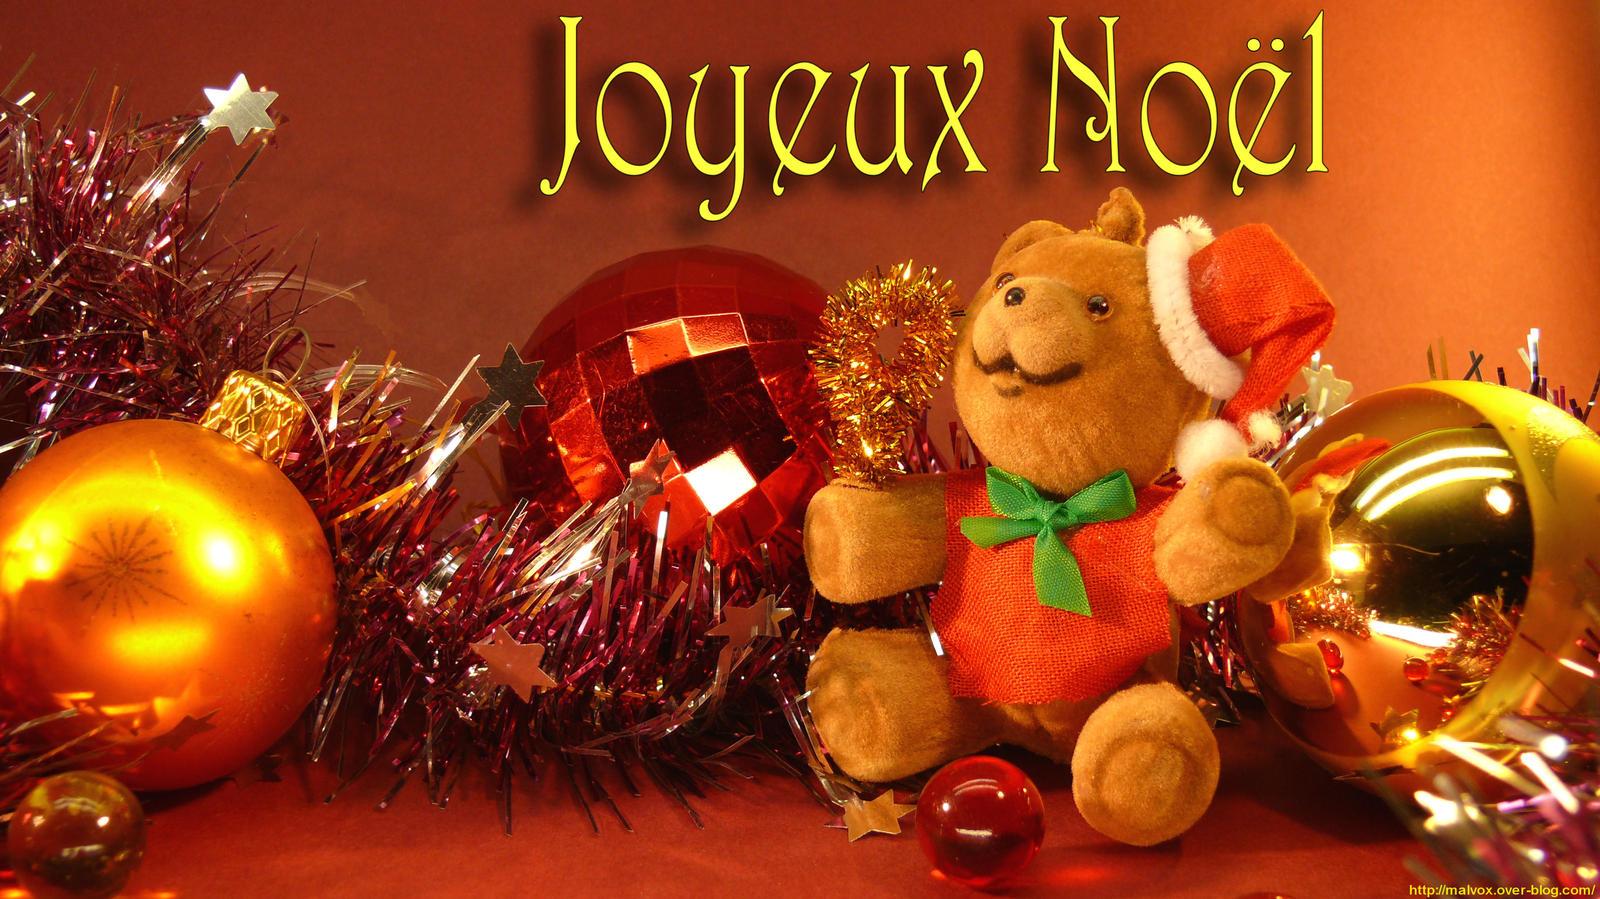 Joyeux noel ours by malvox on deviantart - Guirlande joyeux noel ...